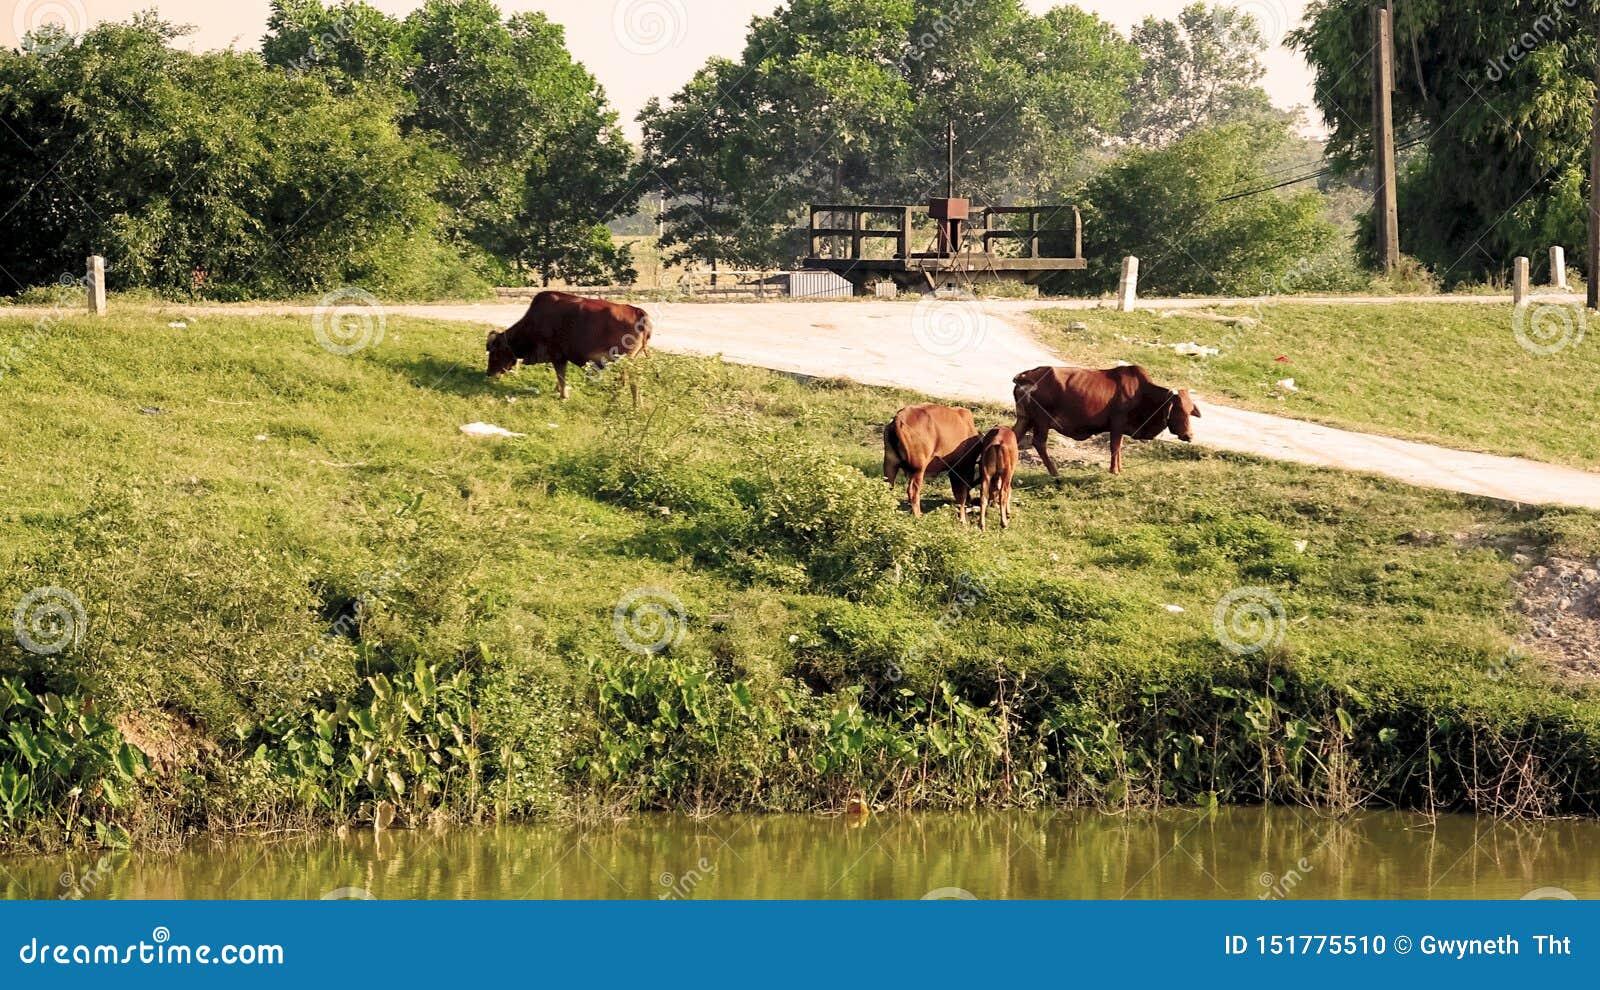 Three cows graze green grass on village roads